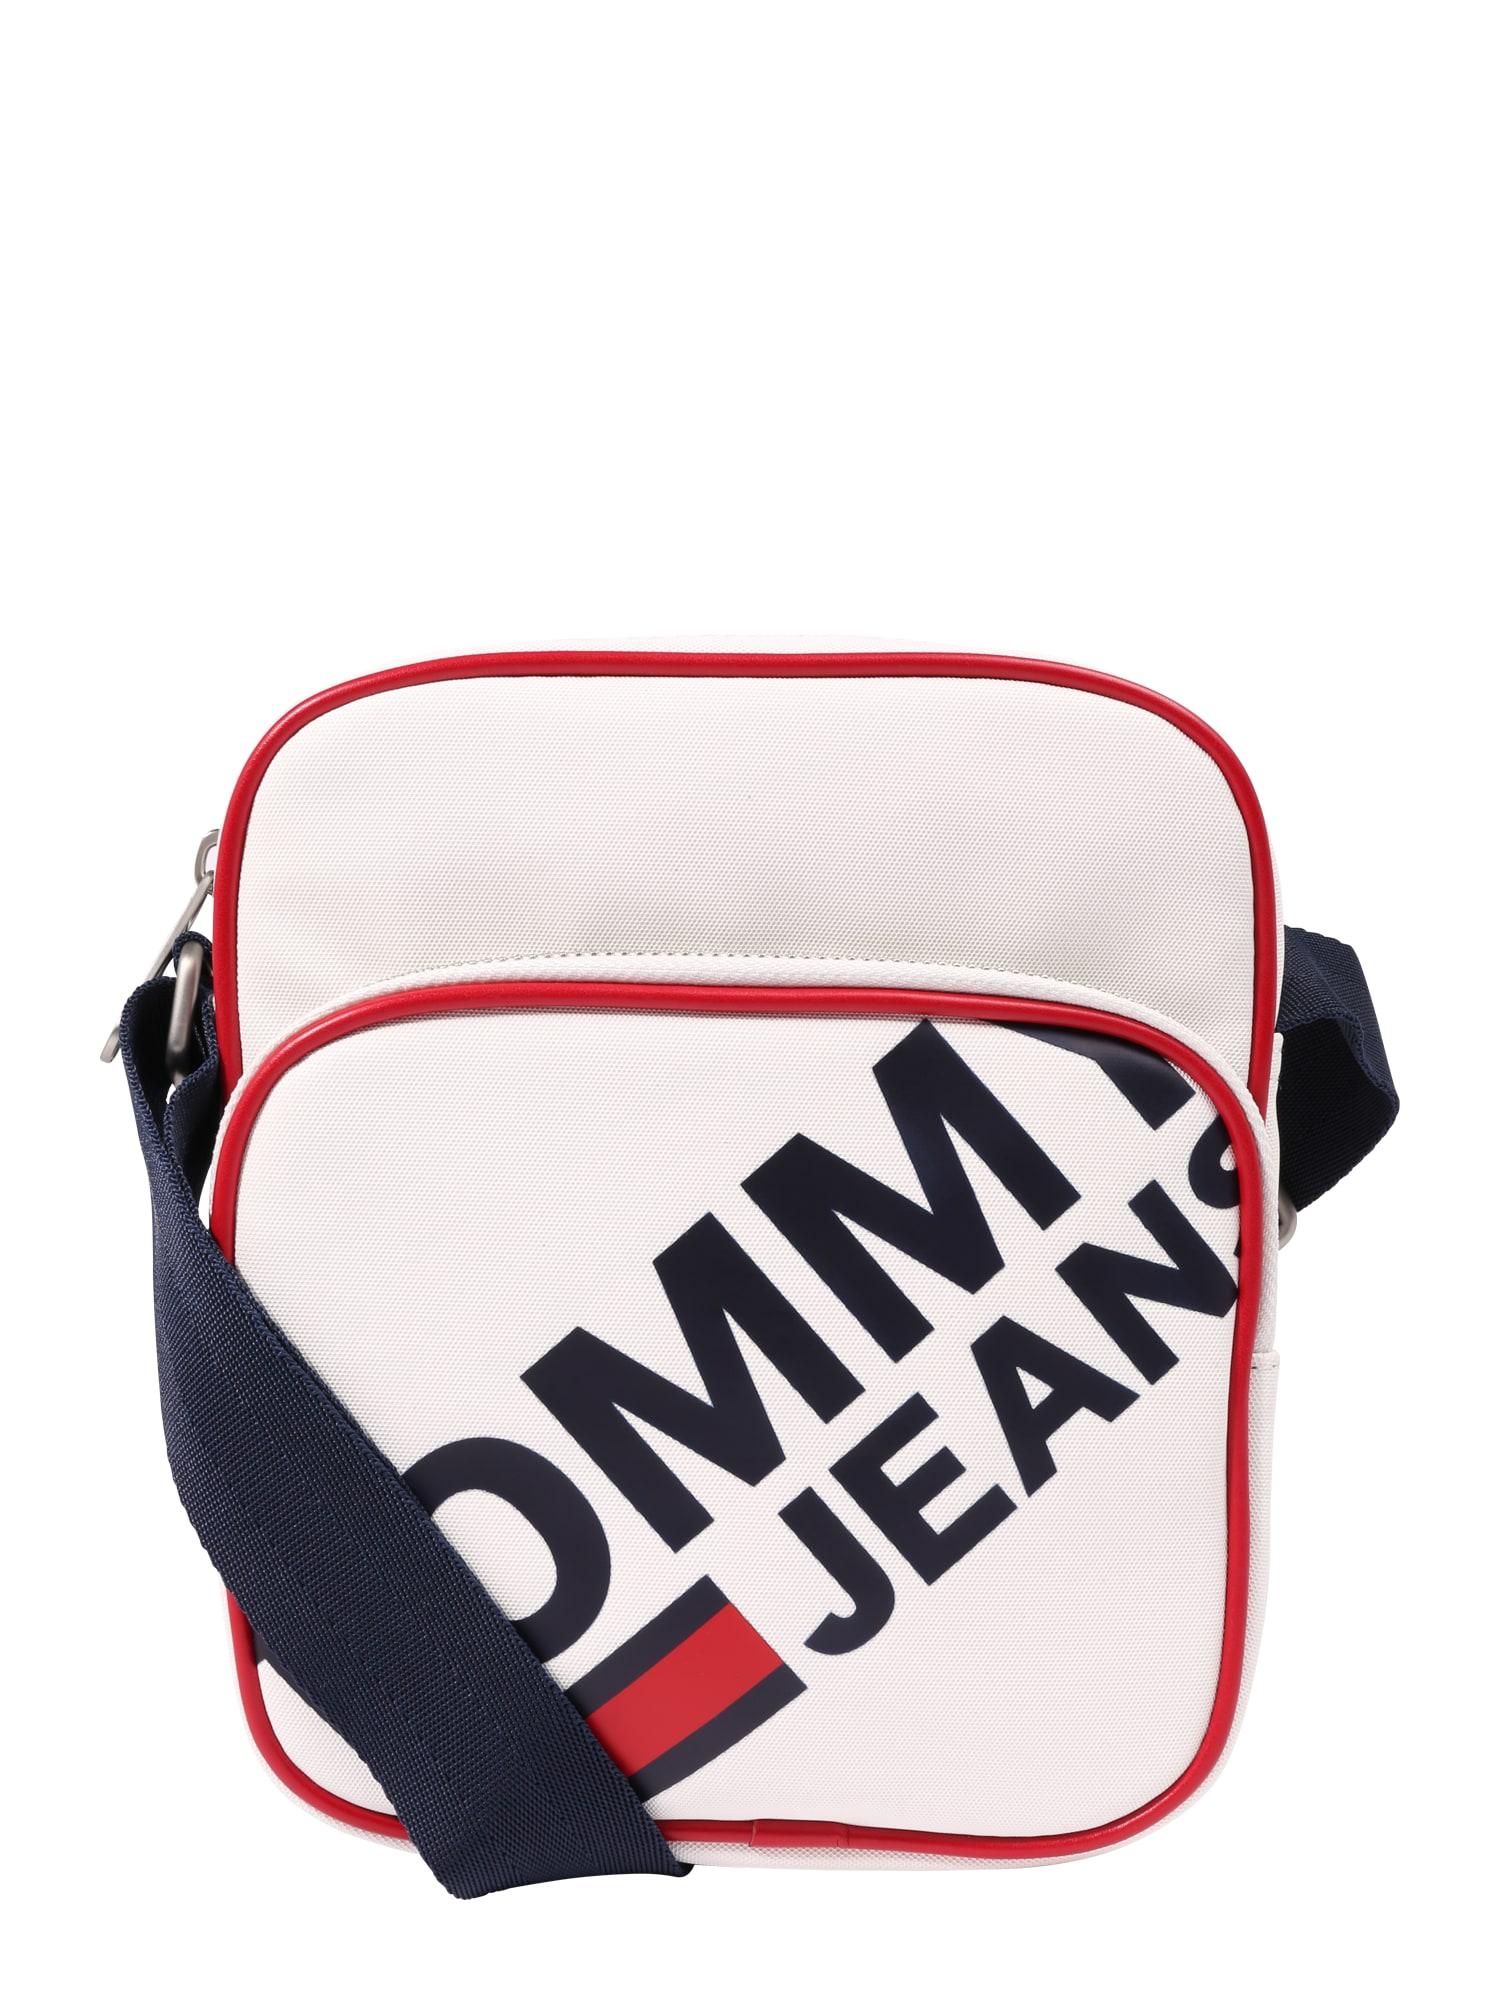 Taška přes rameno TJM MODERN PREP MINI REPORTER bílá Tommy Jeans